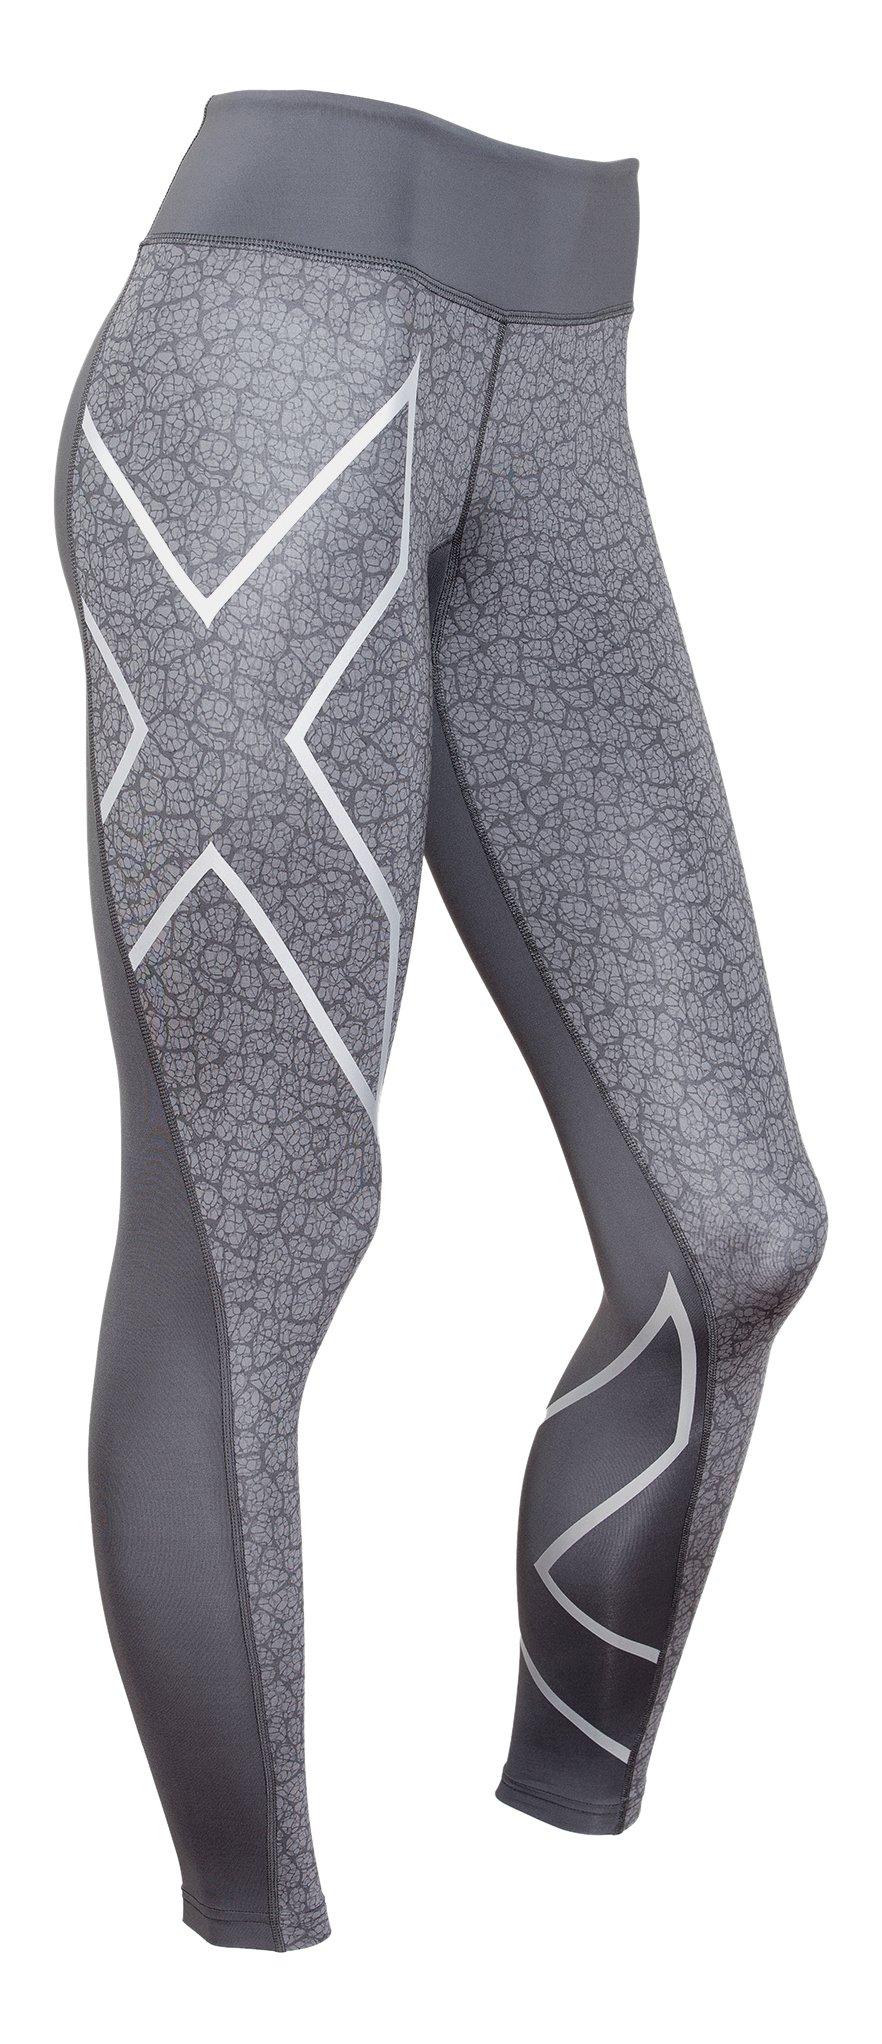 2XU Women's Mid-Rise Compression Tights, Dark Slate/Bone Print, Large